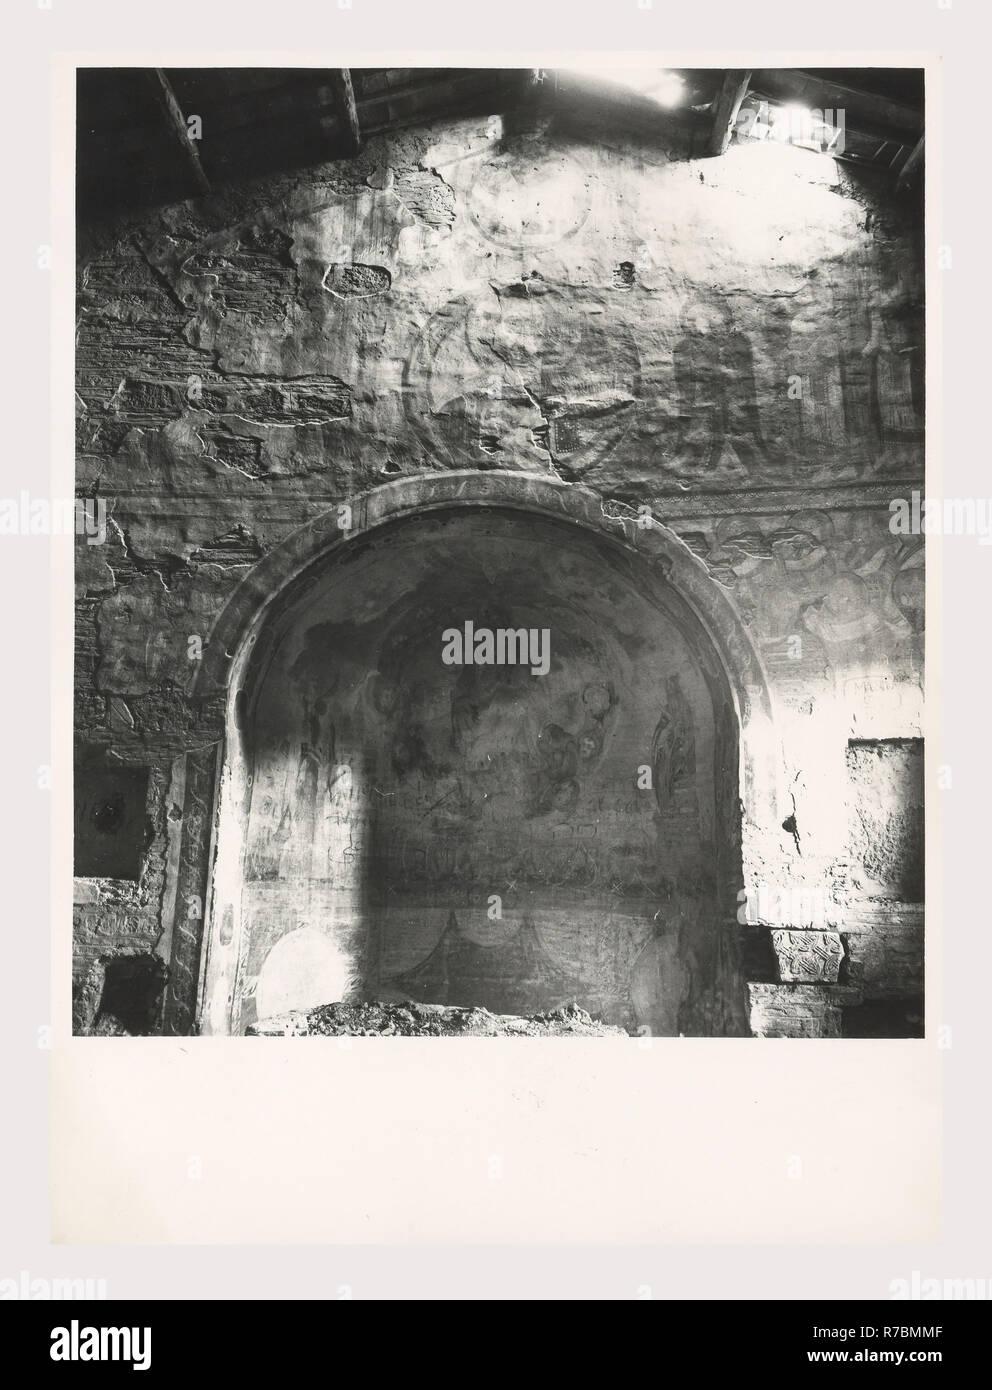 Showroom It Rignano Flaminio 12th century apse stock photos & 12th century apse stock